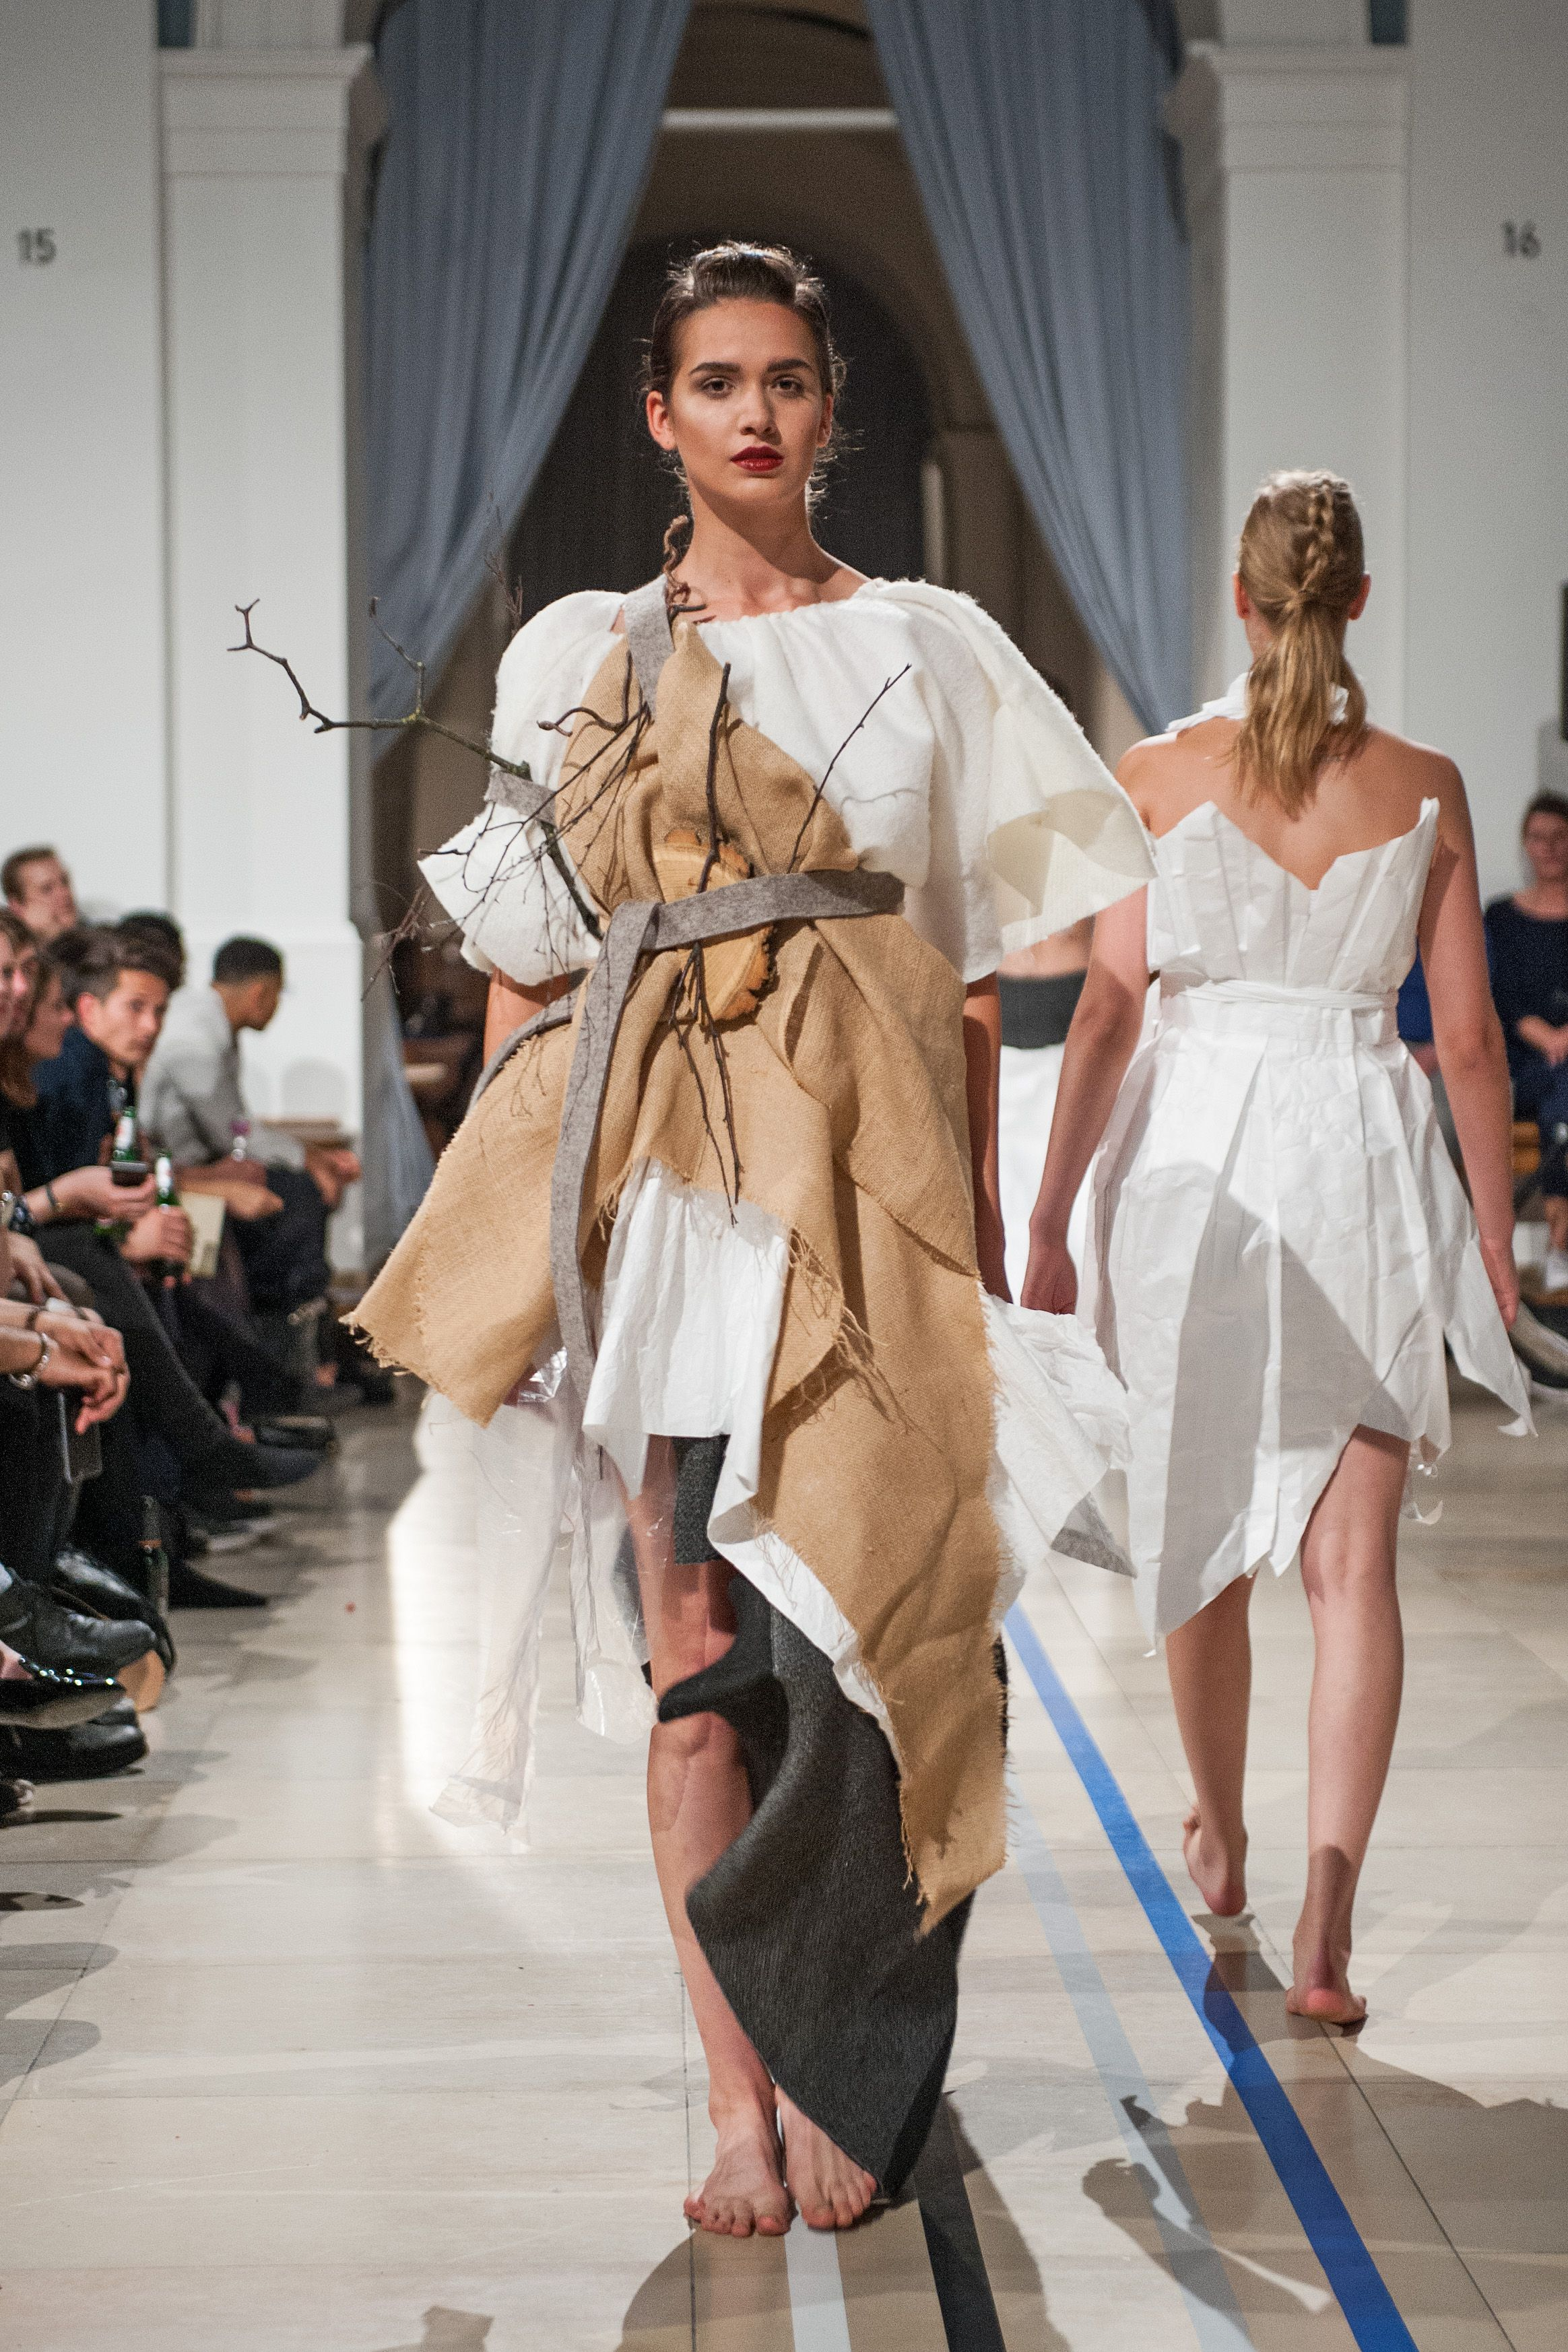 Fashionphotography fashionshow fashion photography fashiondesign